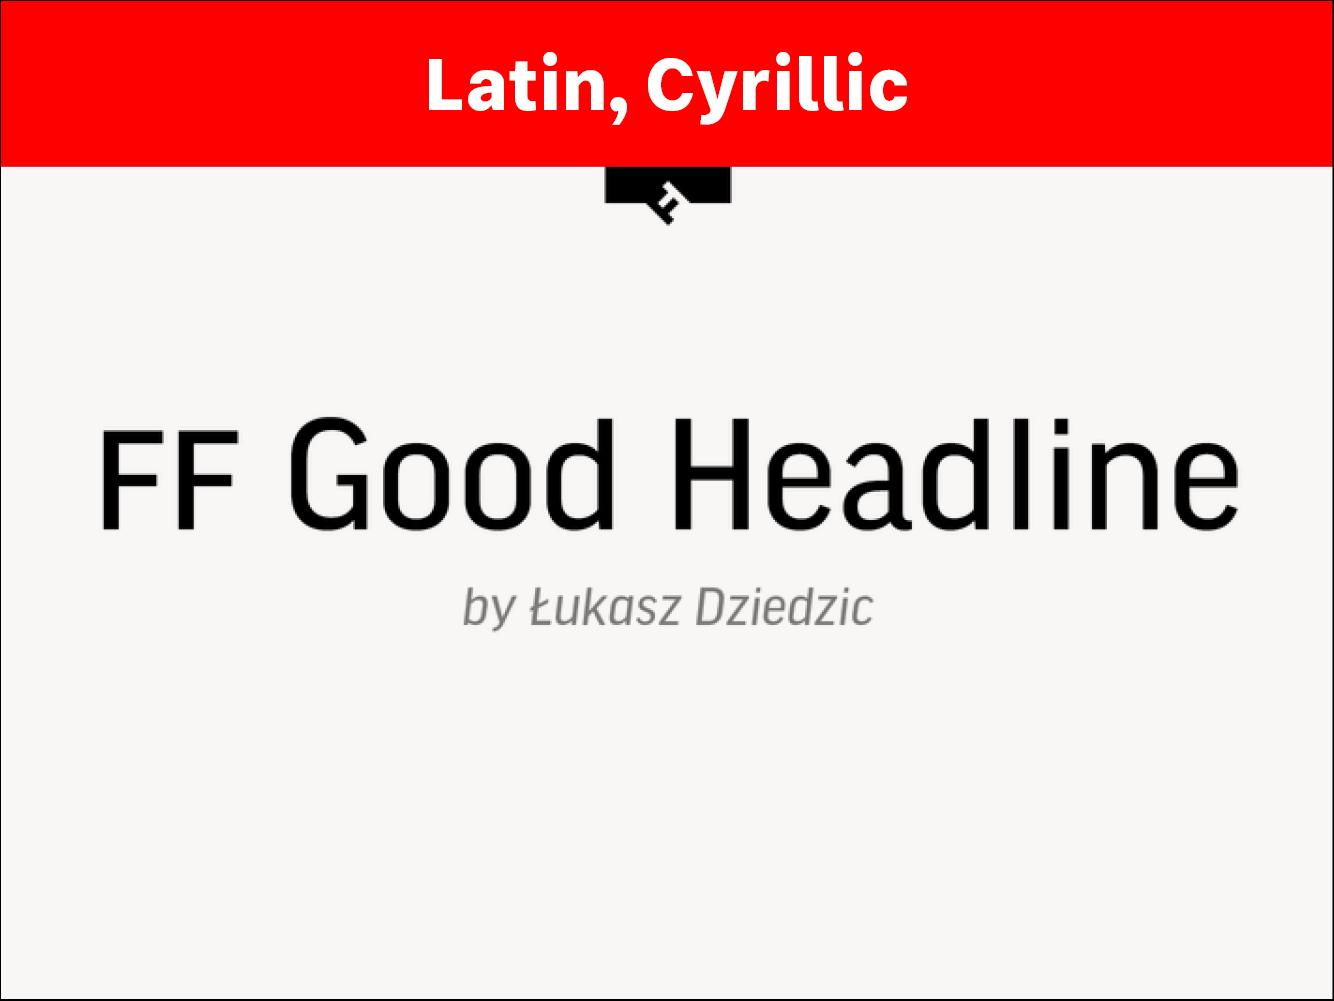 FF Good Headline